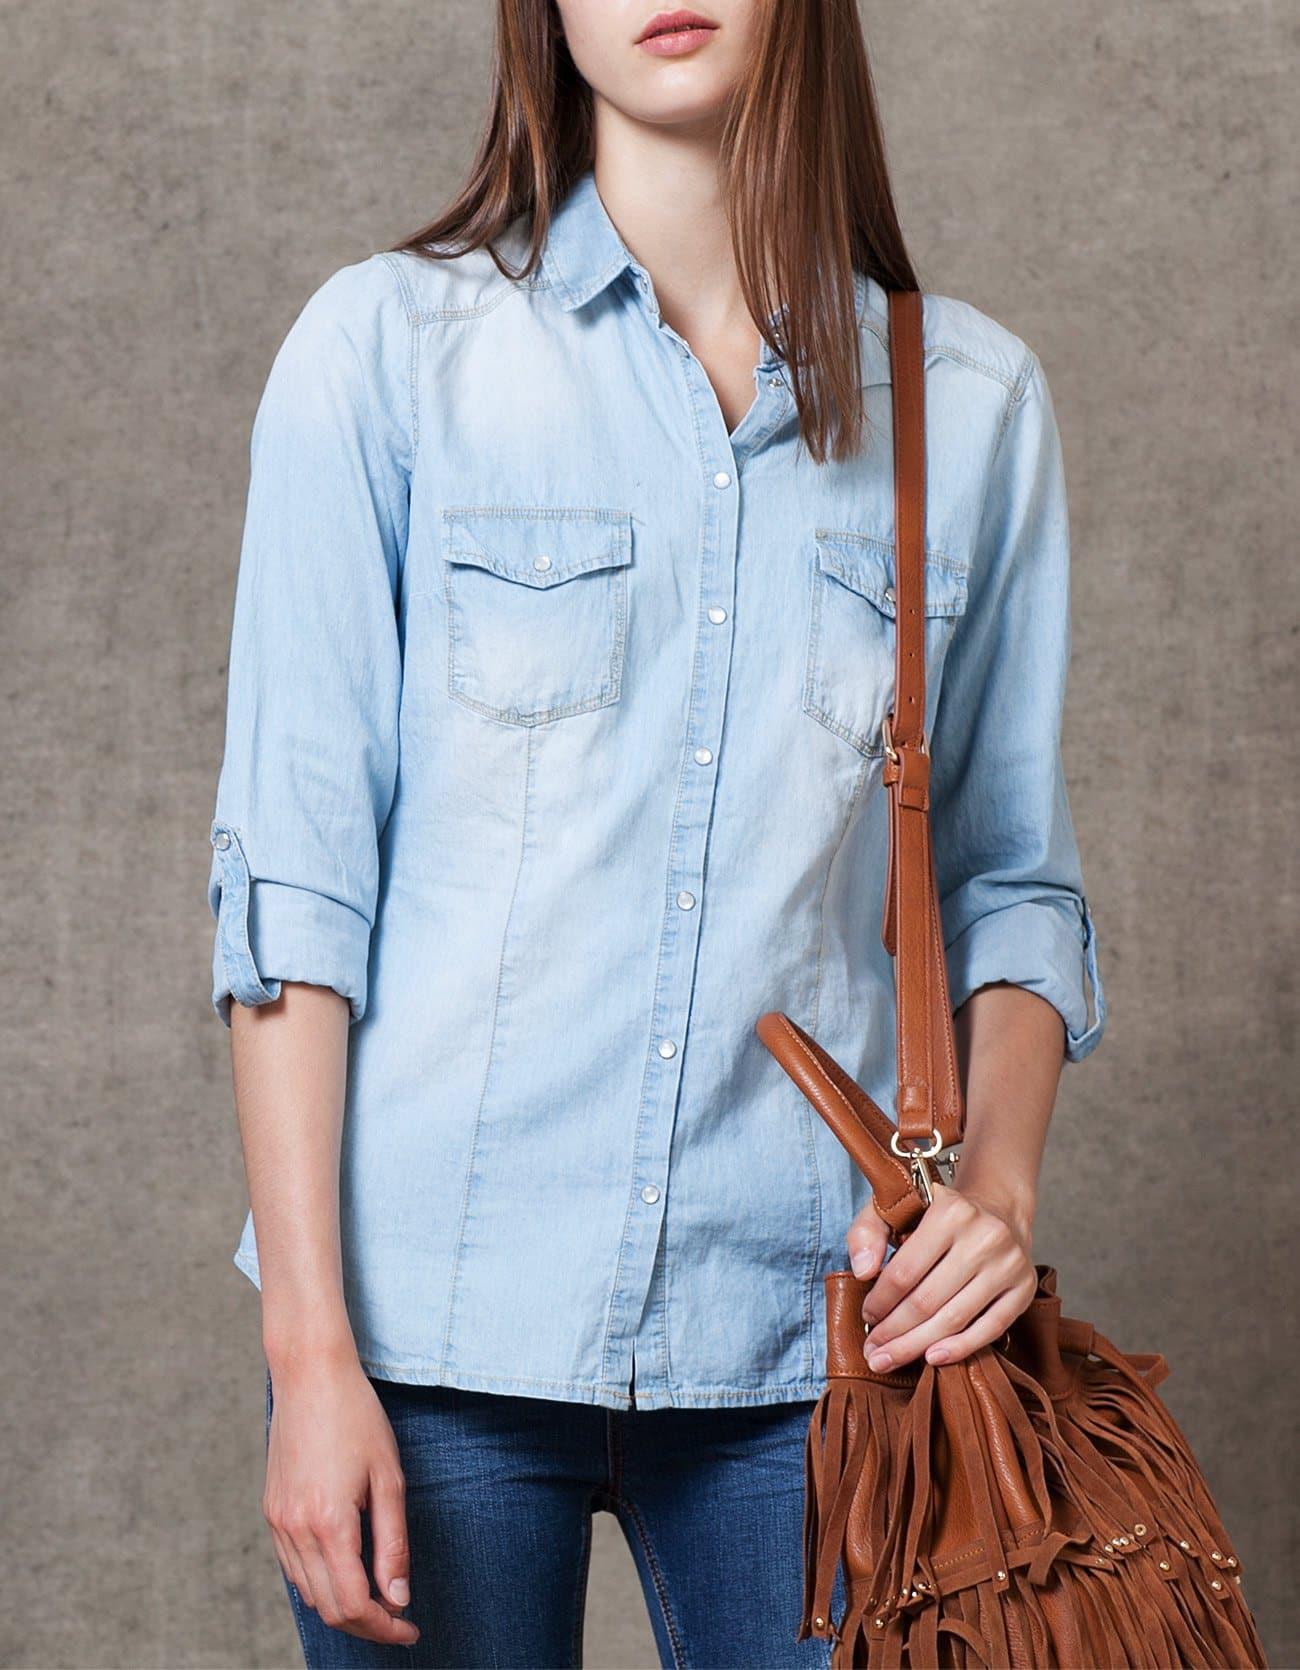 7_camicia di jeans